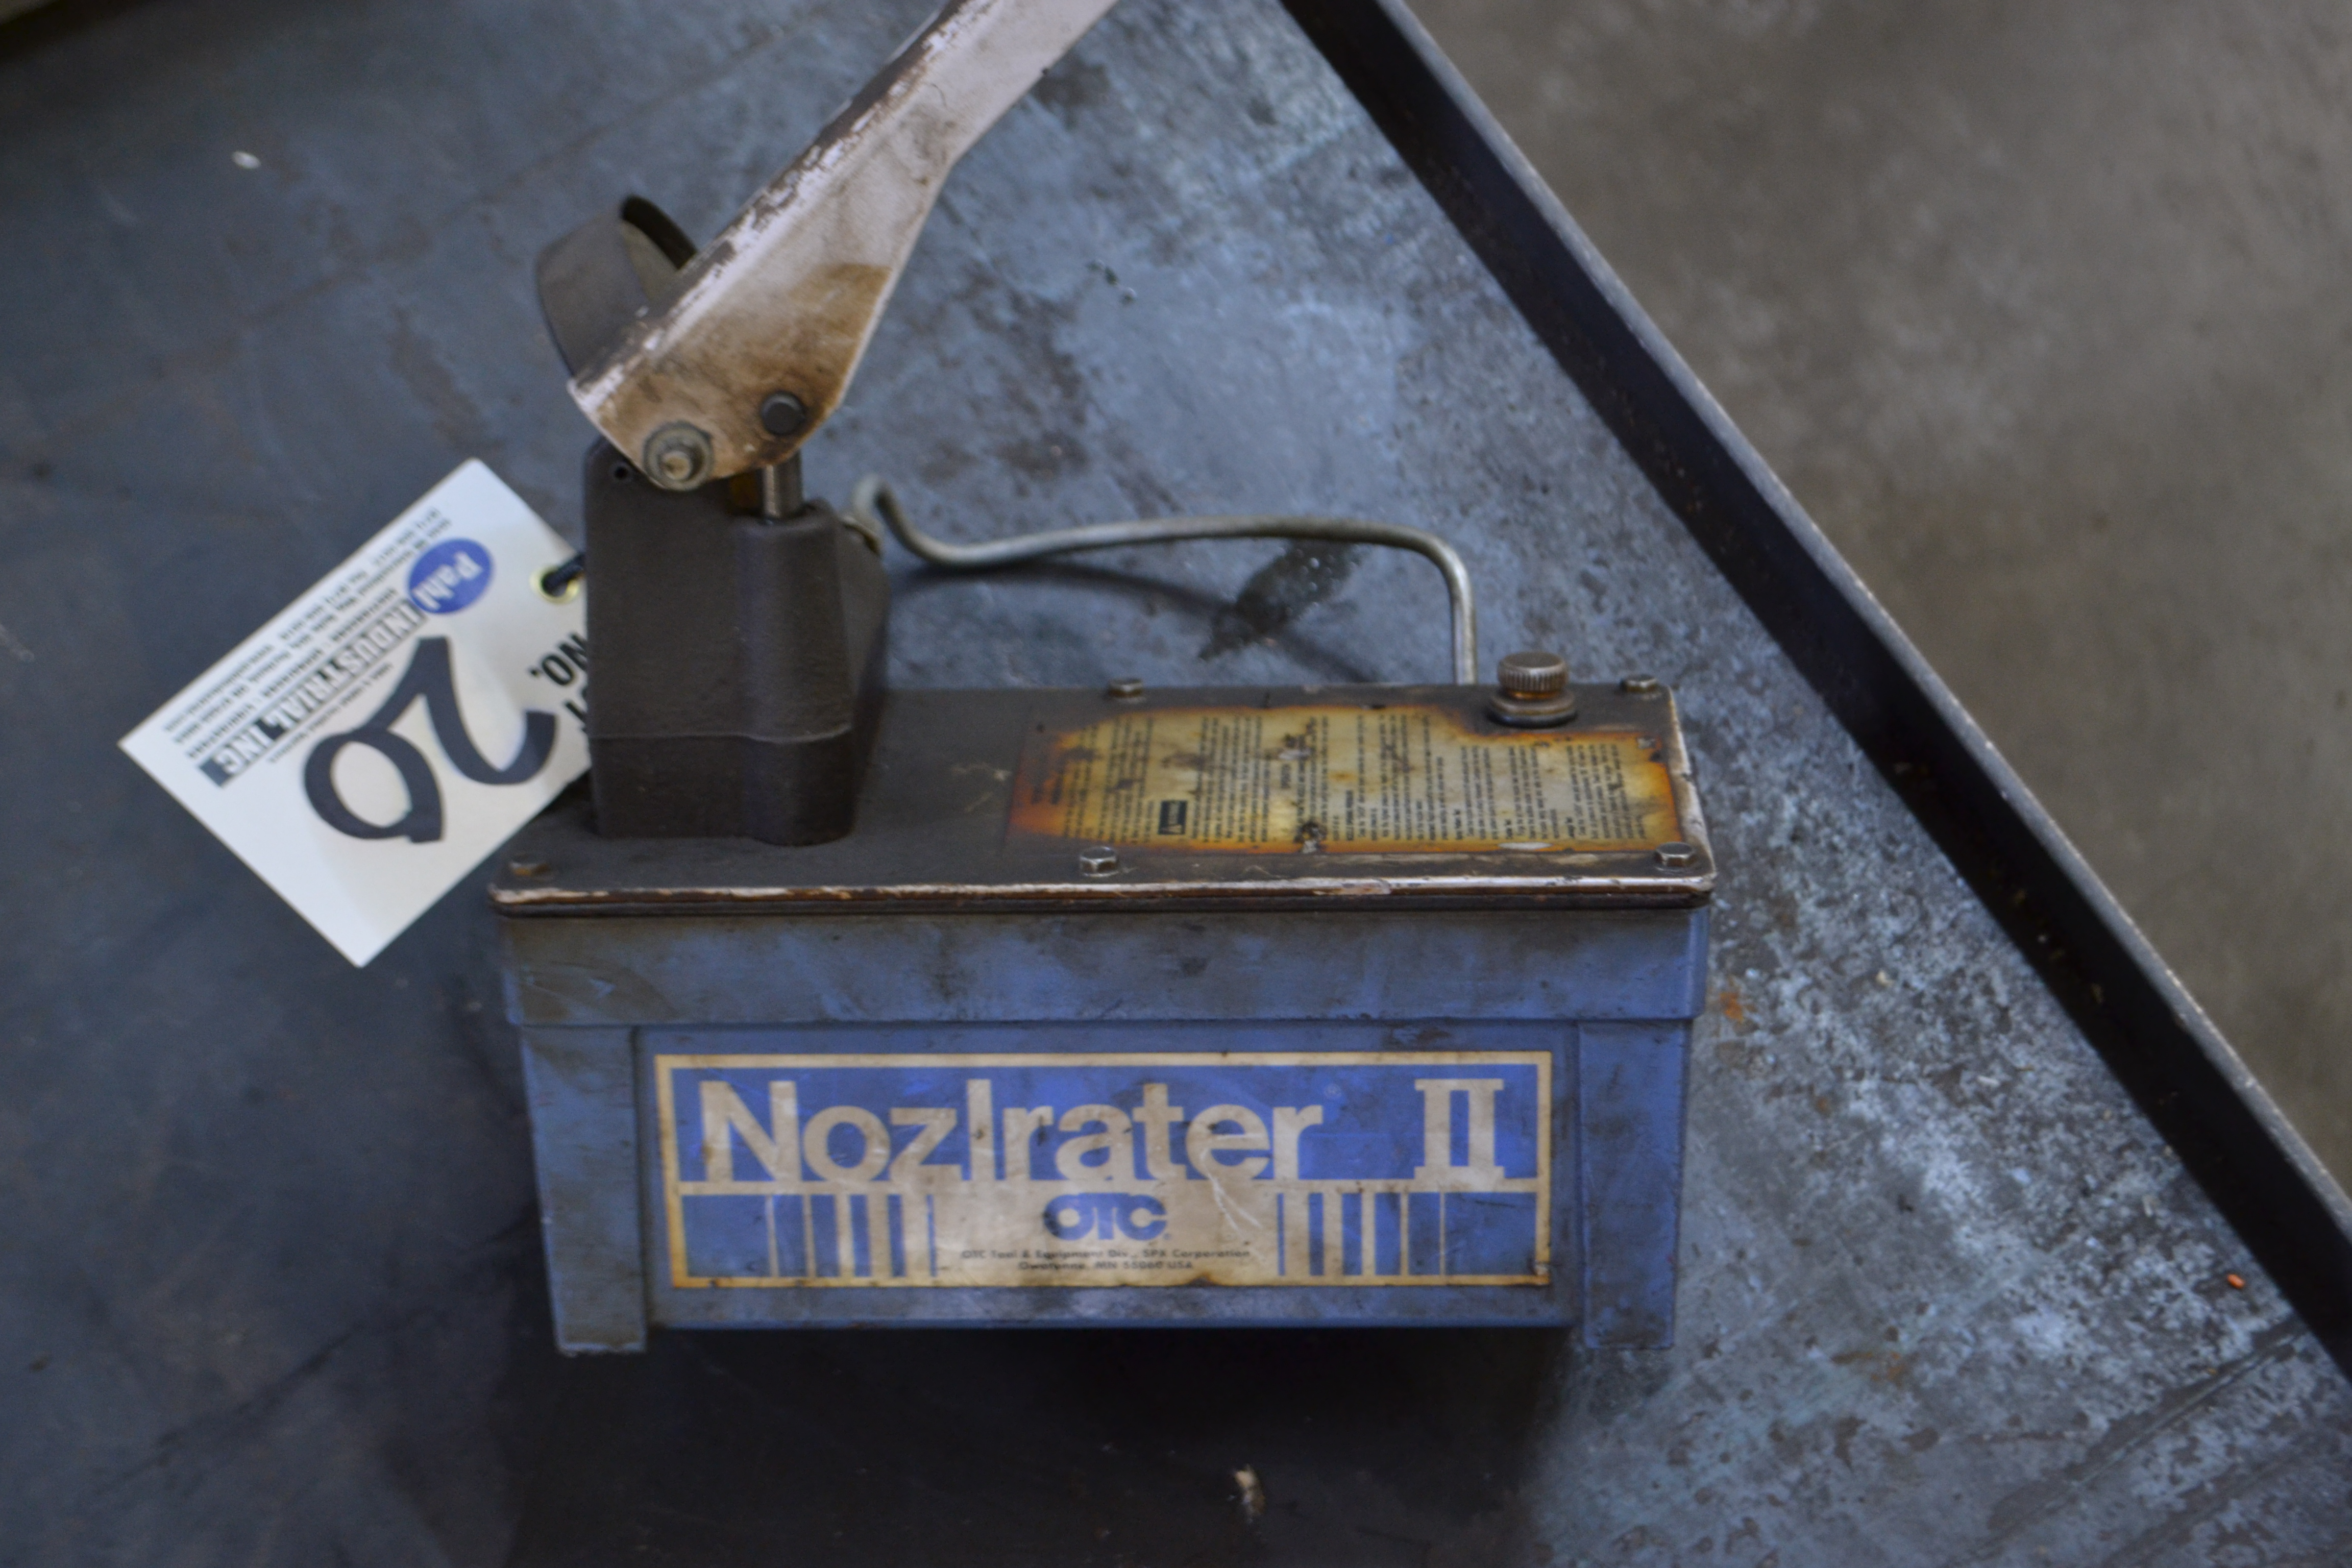 Lot 20 - OTC Nozlrater II Injector Nozzle Tester